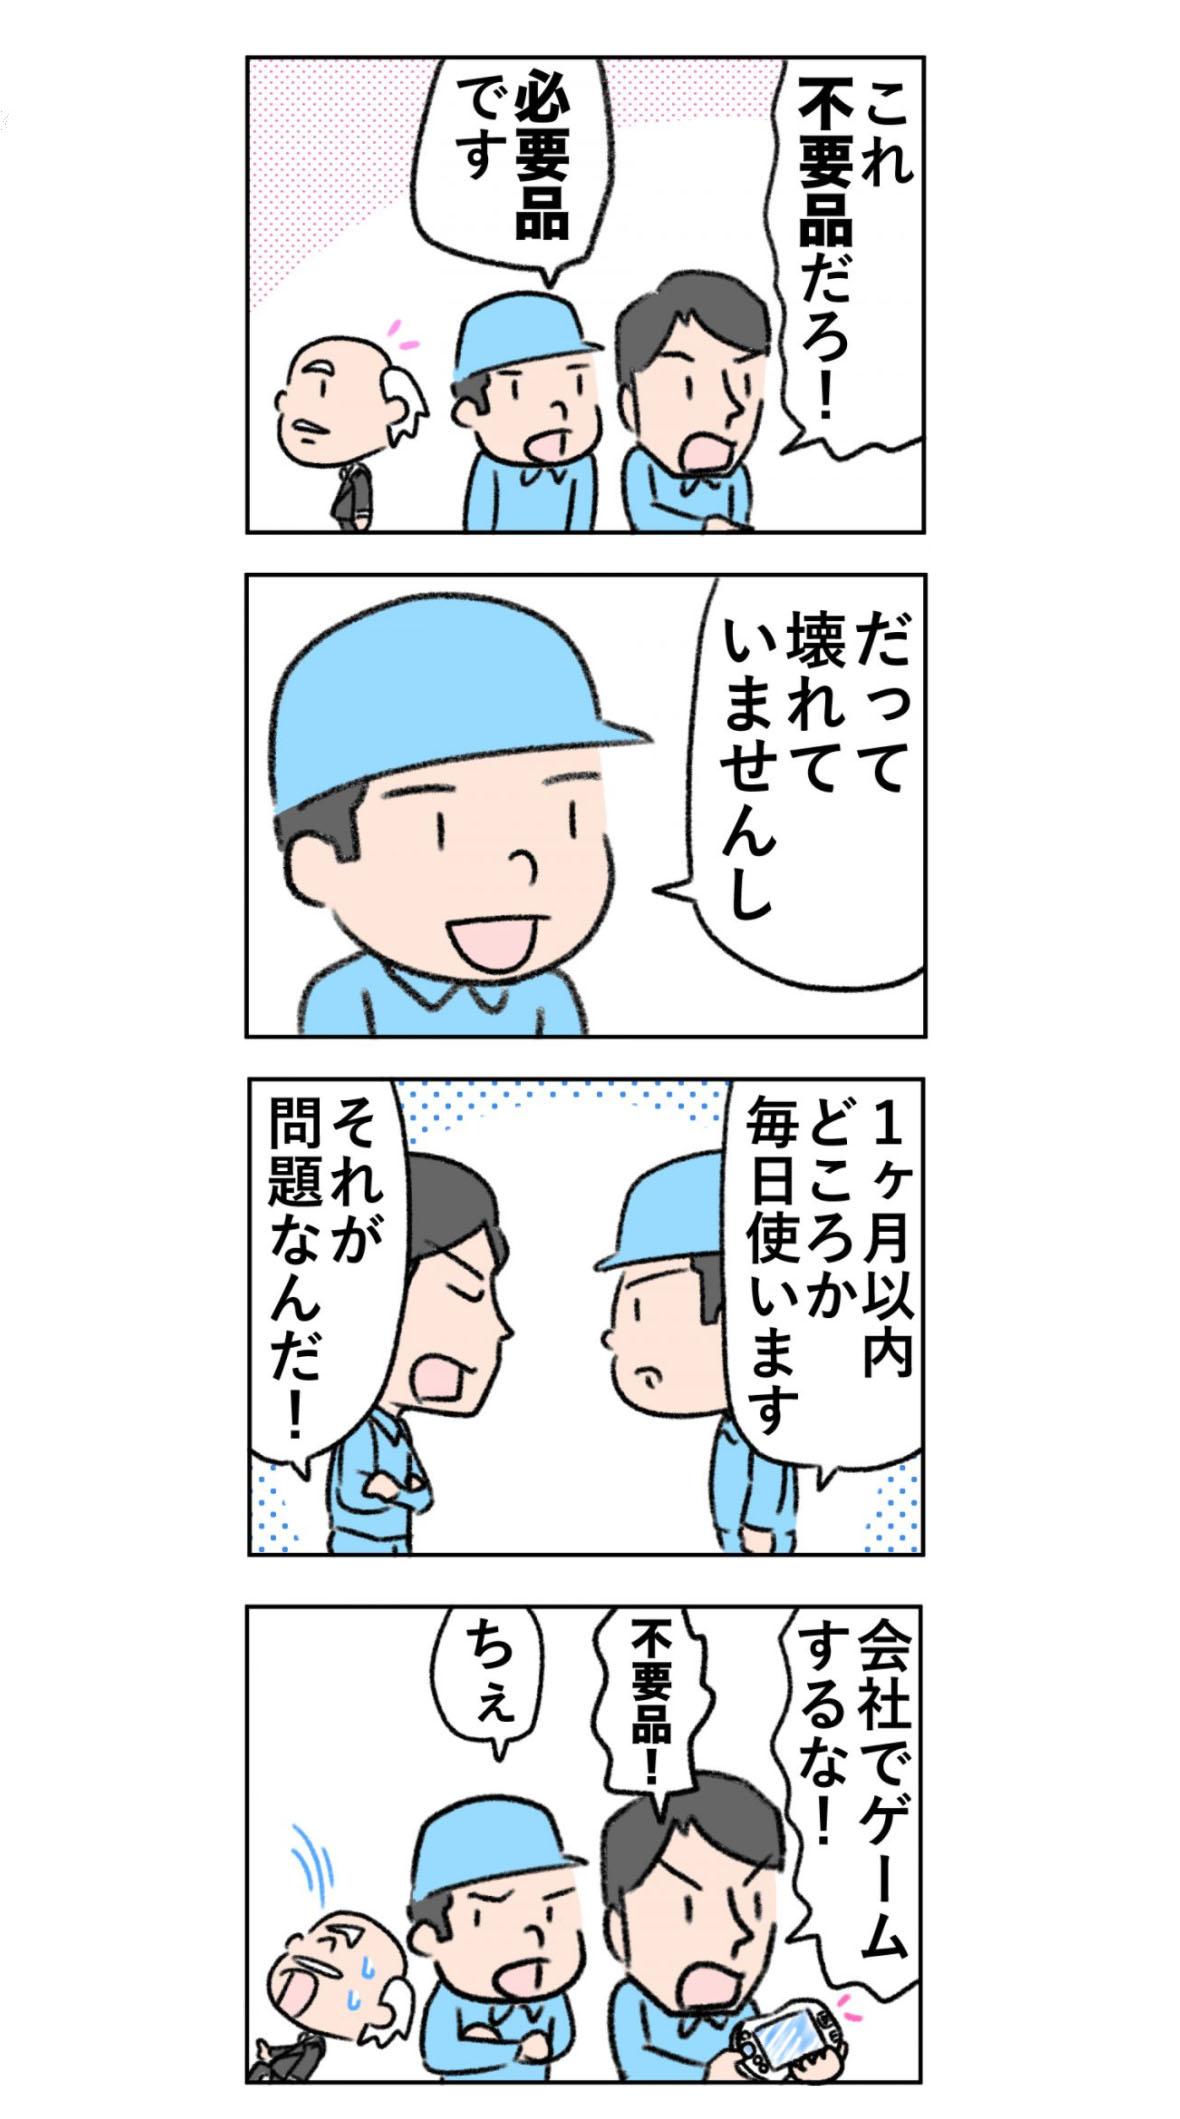 screencapture-kakiuchikaizen-archives-210-1490779931606のコピー